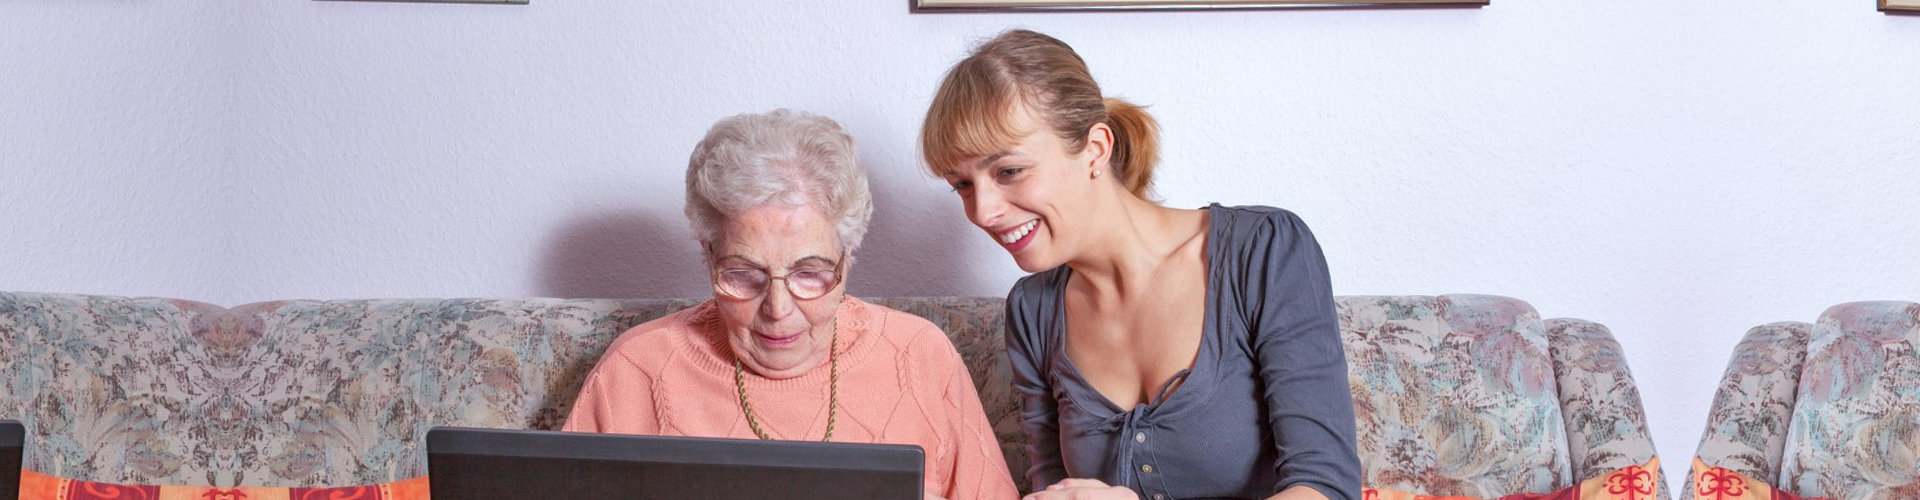 caregiver teaching senior woman to use a laptop